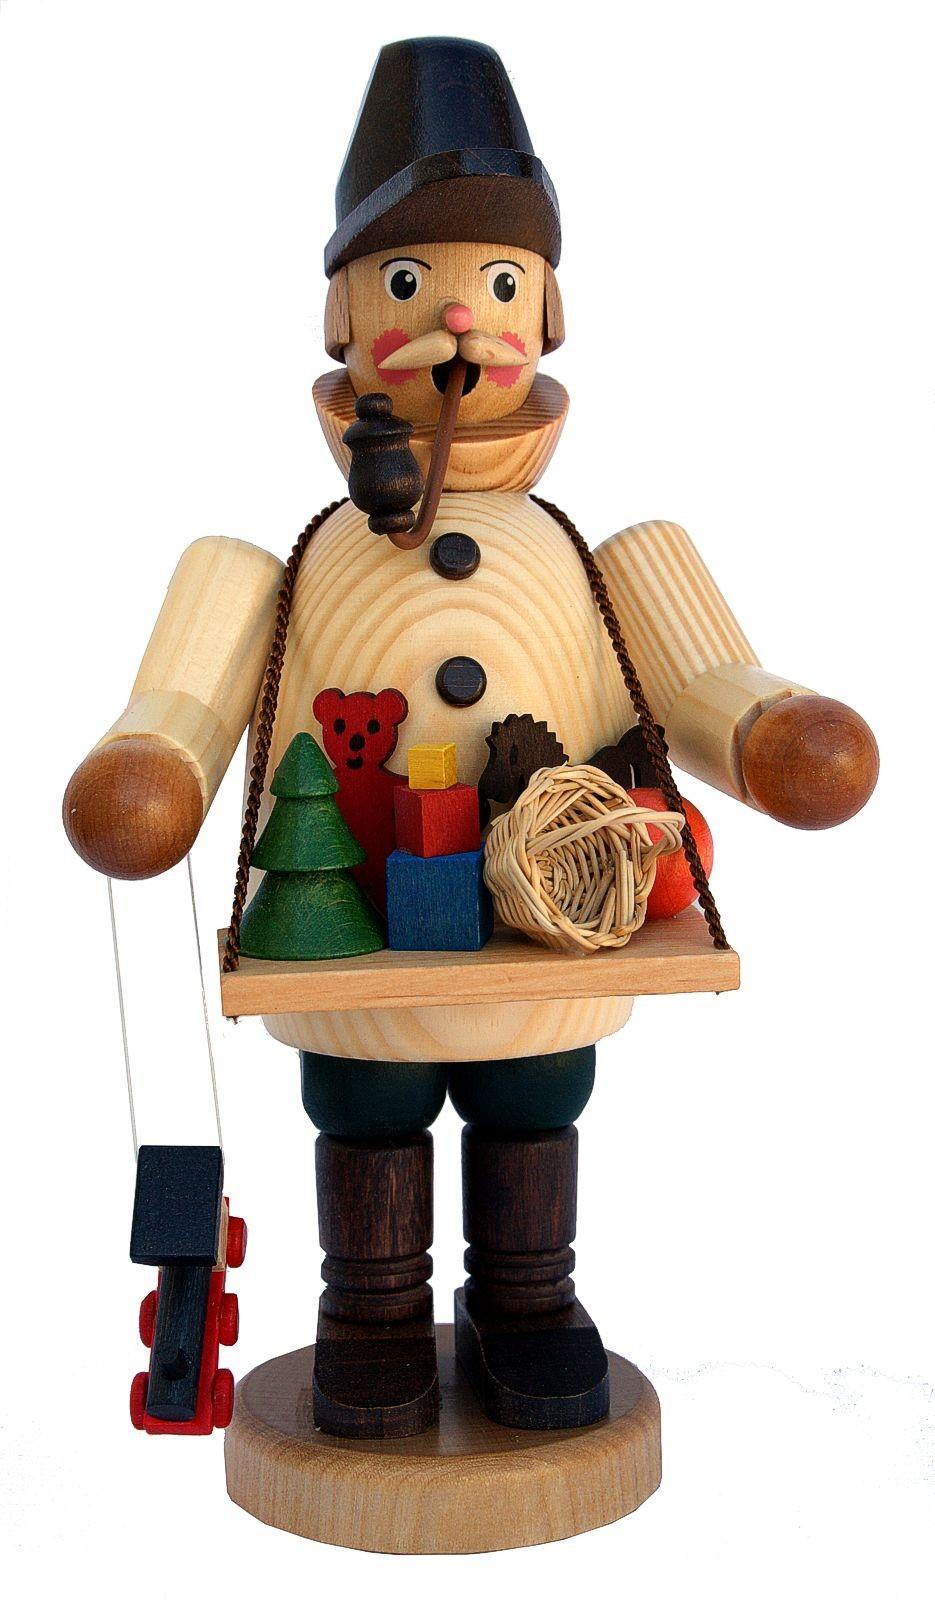 Räuchermännchen Spielzeughändler